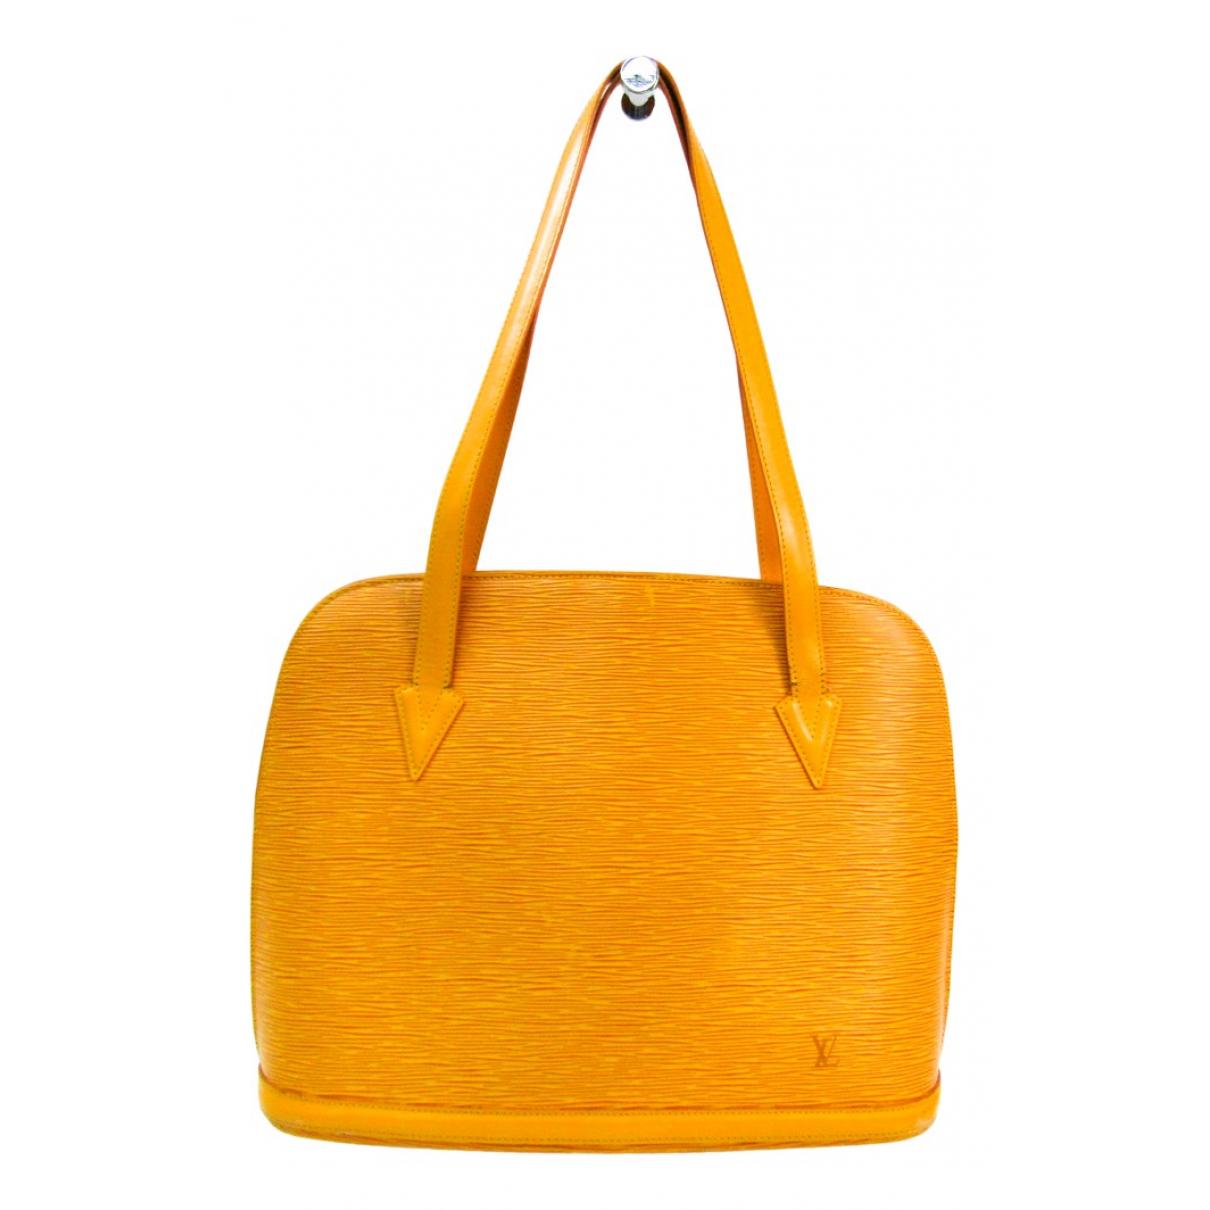 Louis Vuitton Lussac Yellow Leather handbag for Women \N